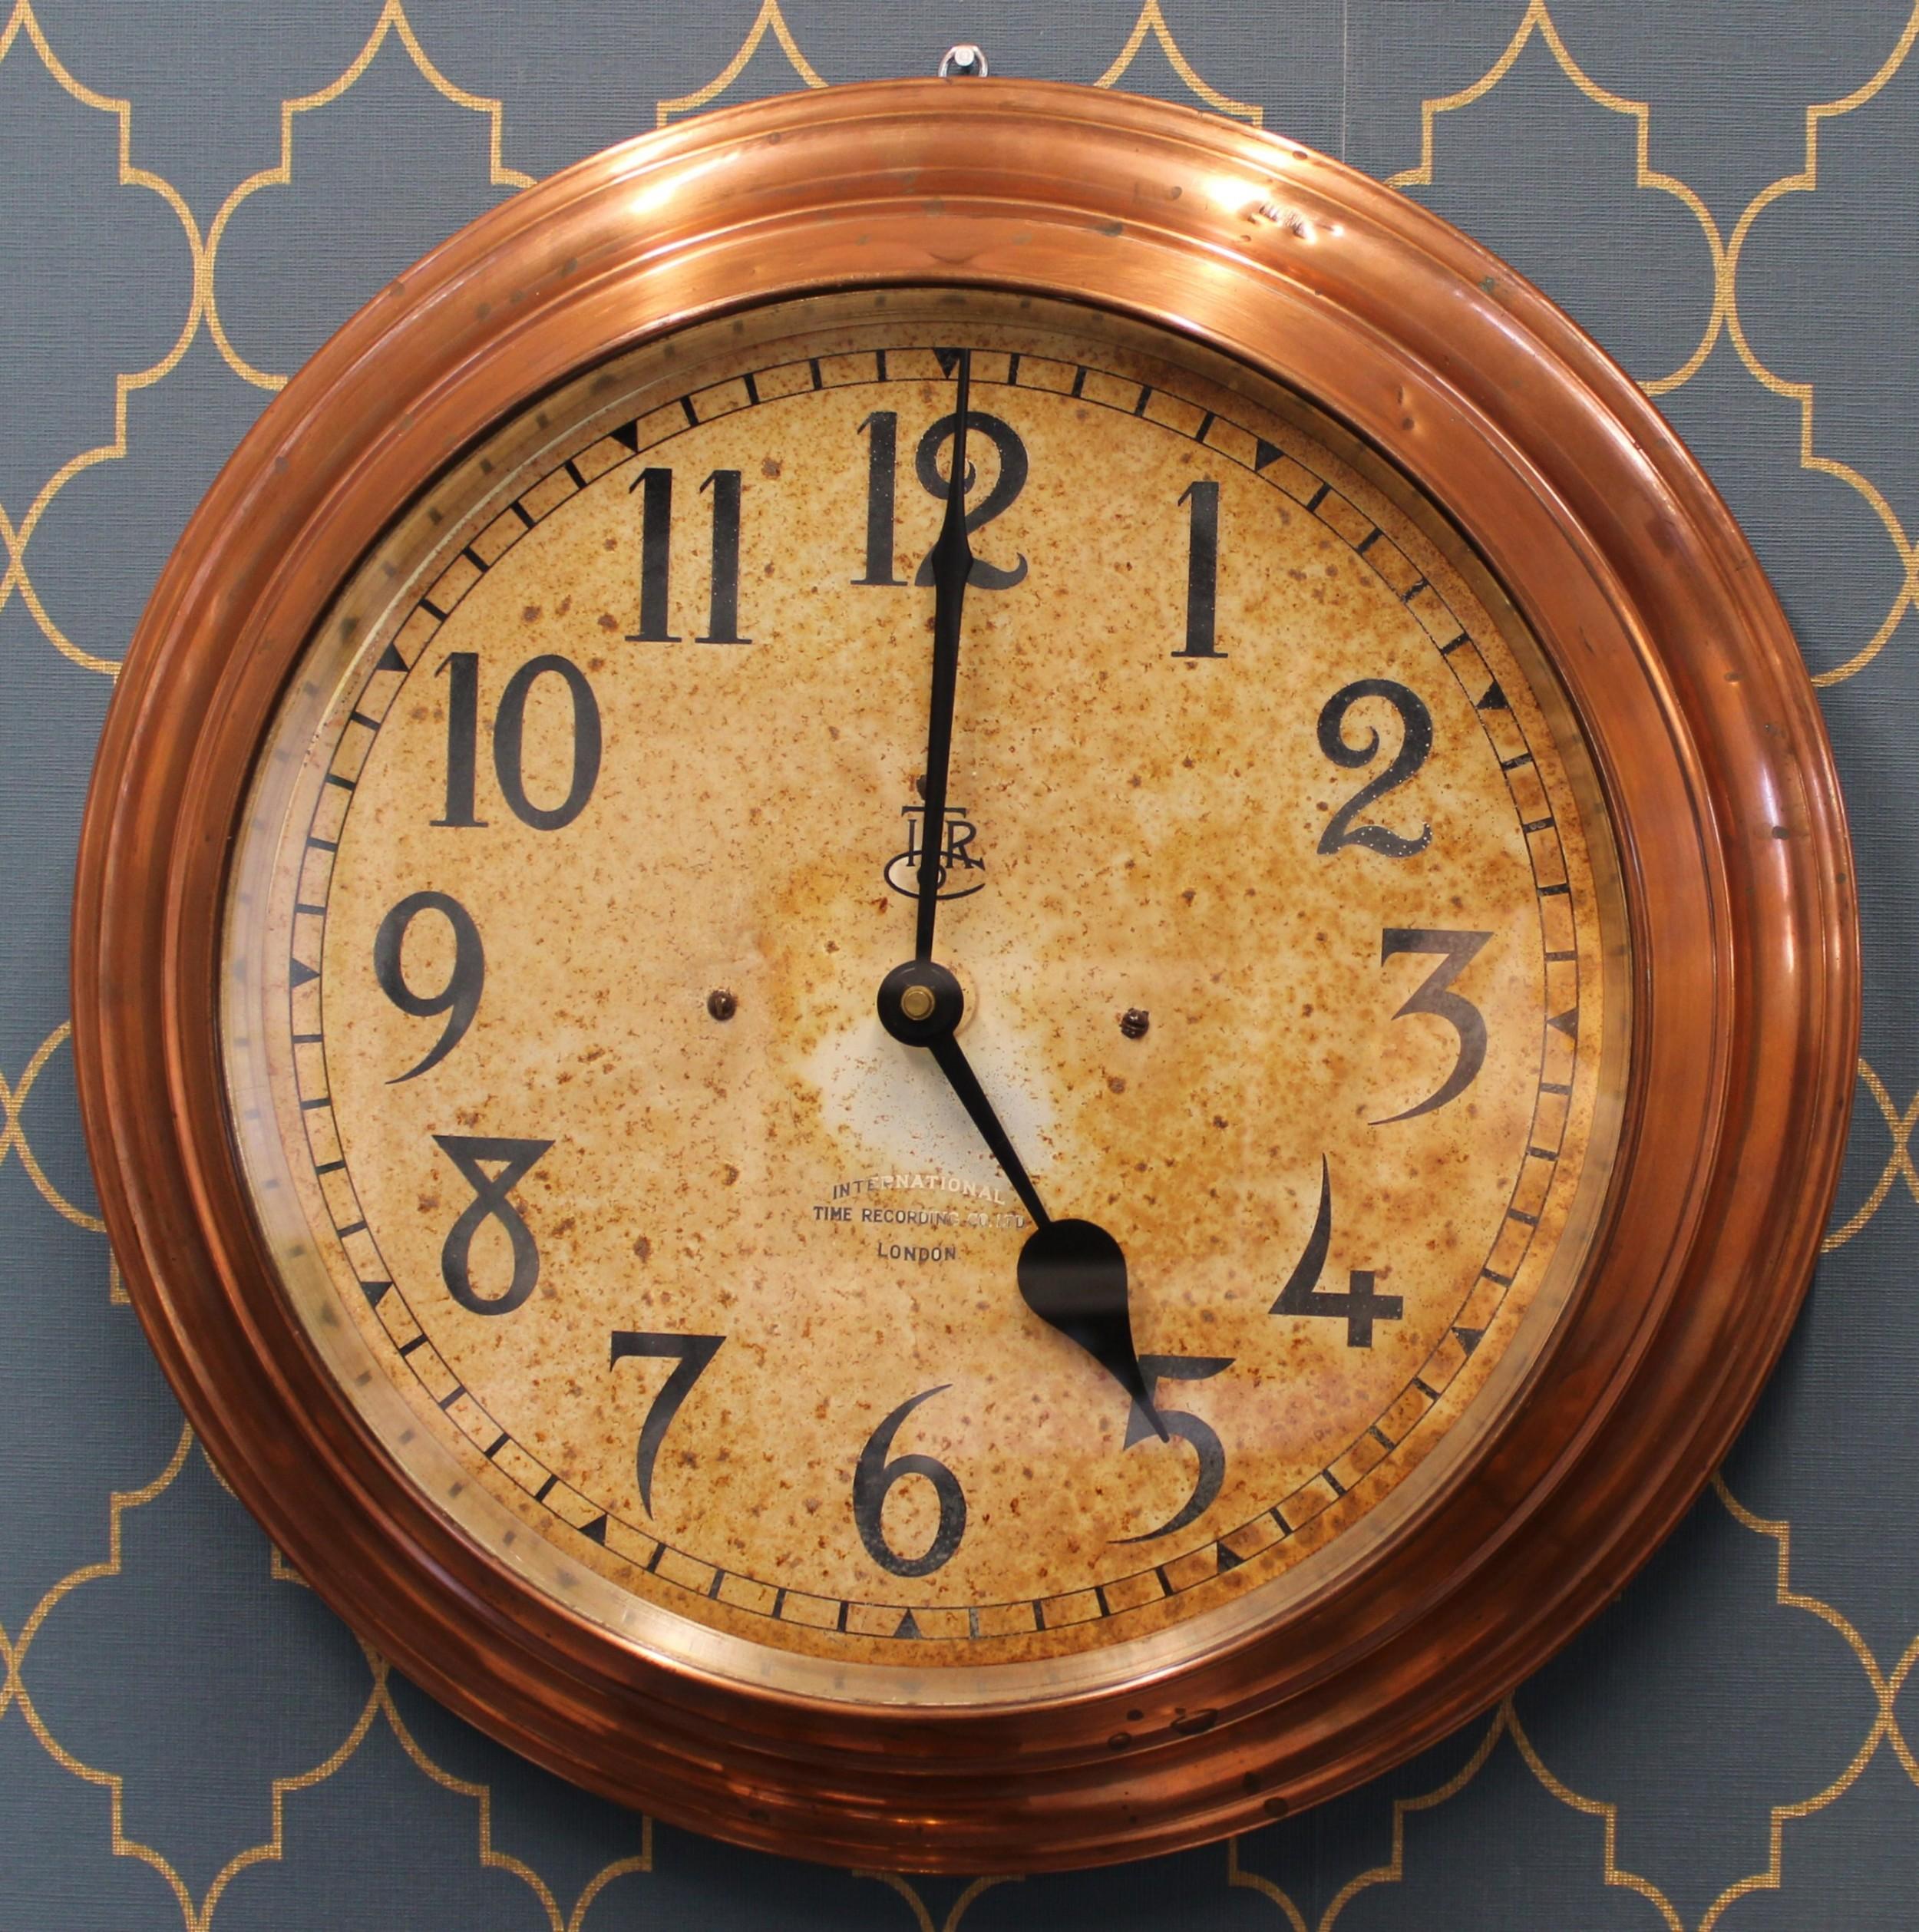 itr international slave clock